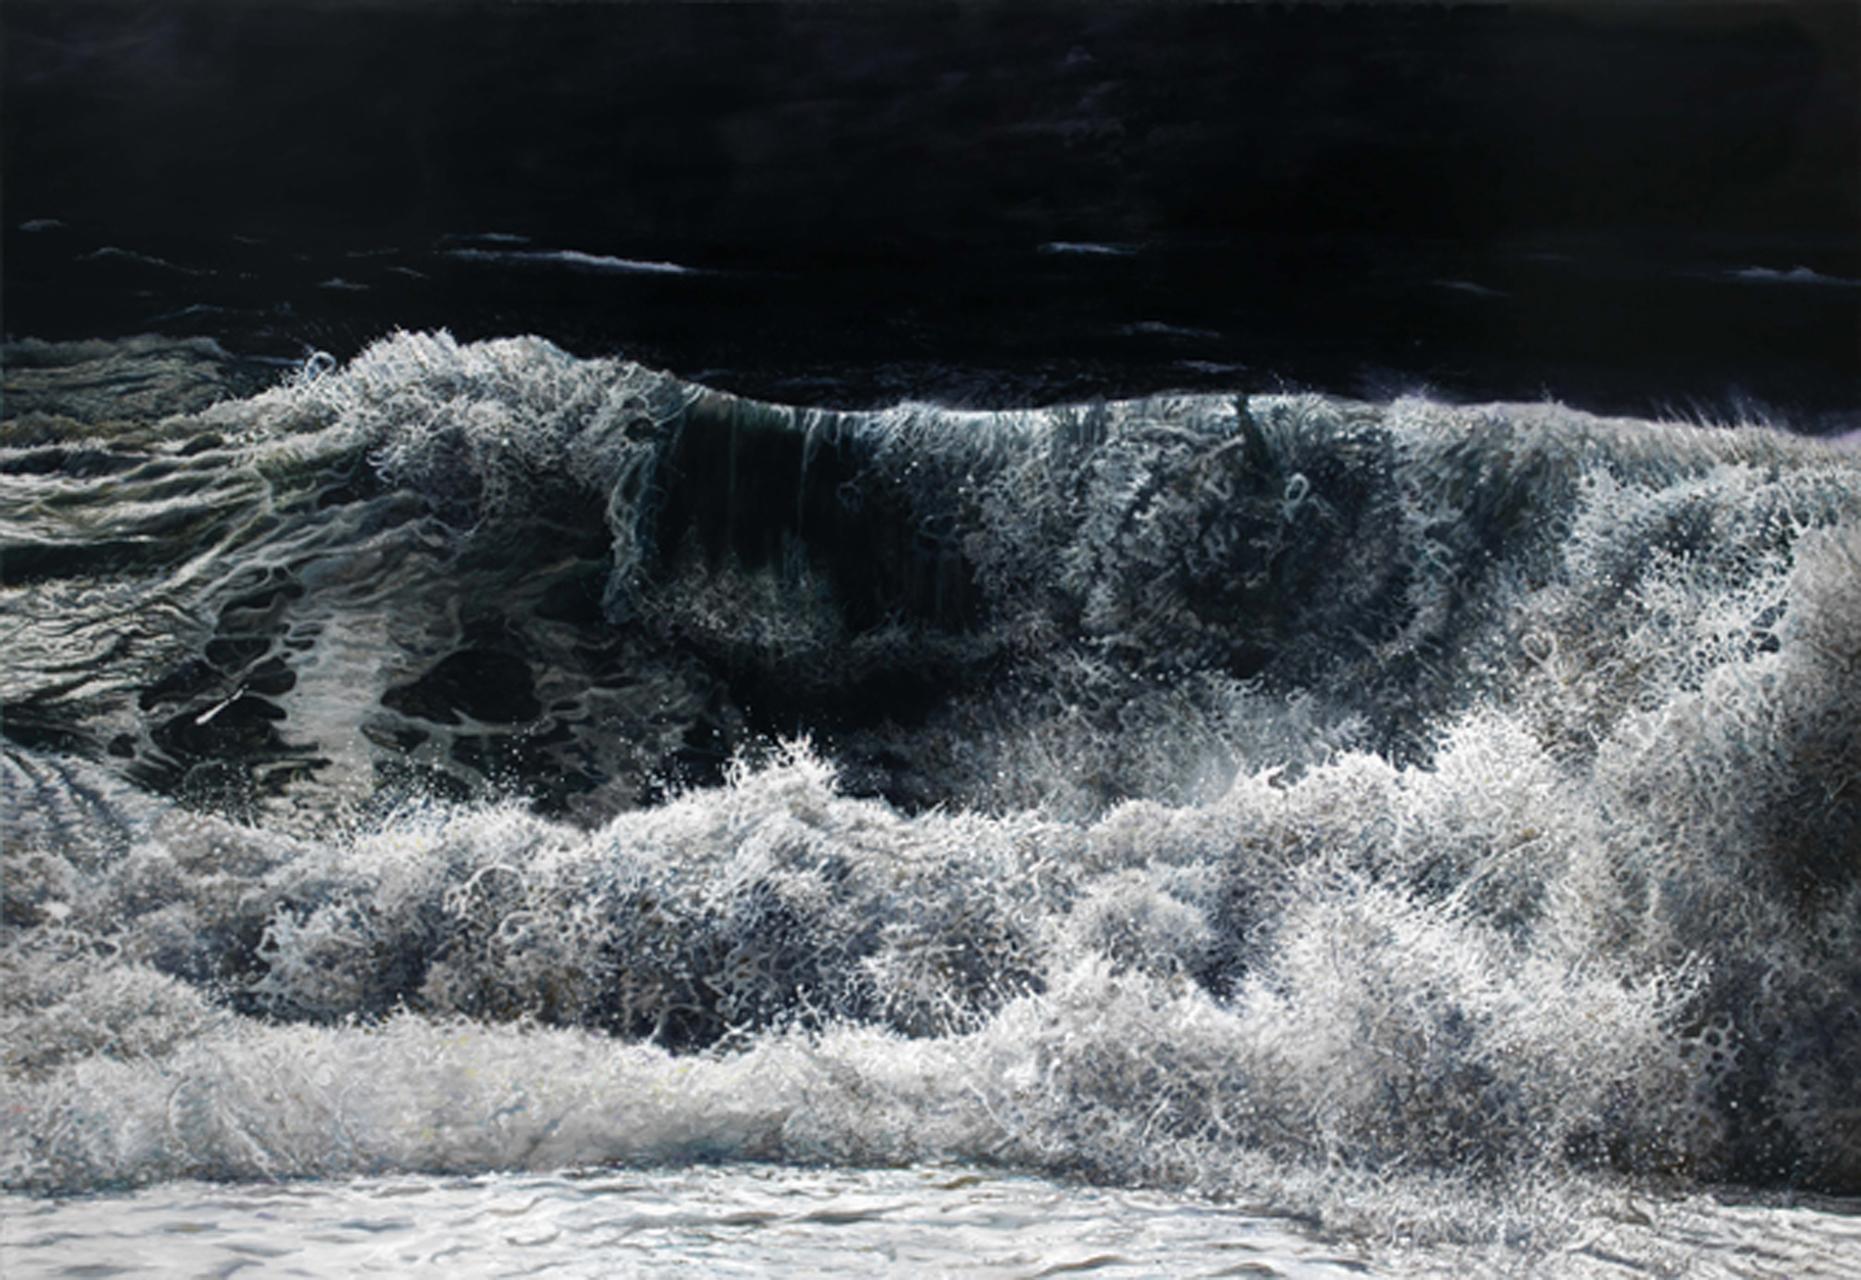 Dimitris Tzamouranis, 36°45´N-021°56´E (Die Welle), 2015, Öl auf Leinwand, 235 x 340 cm